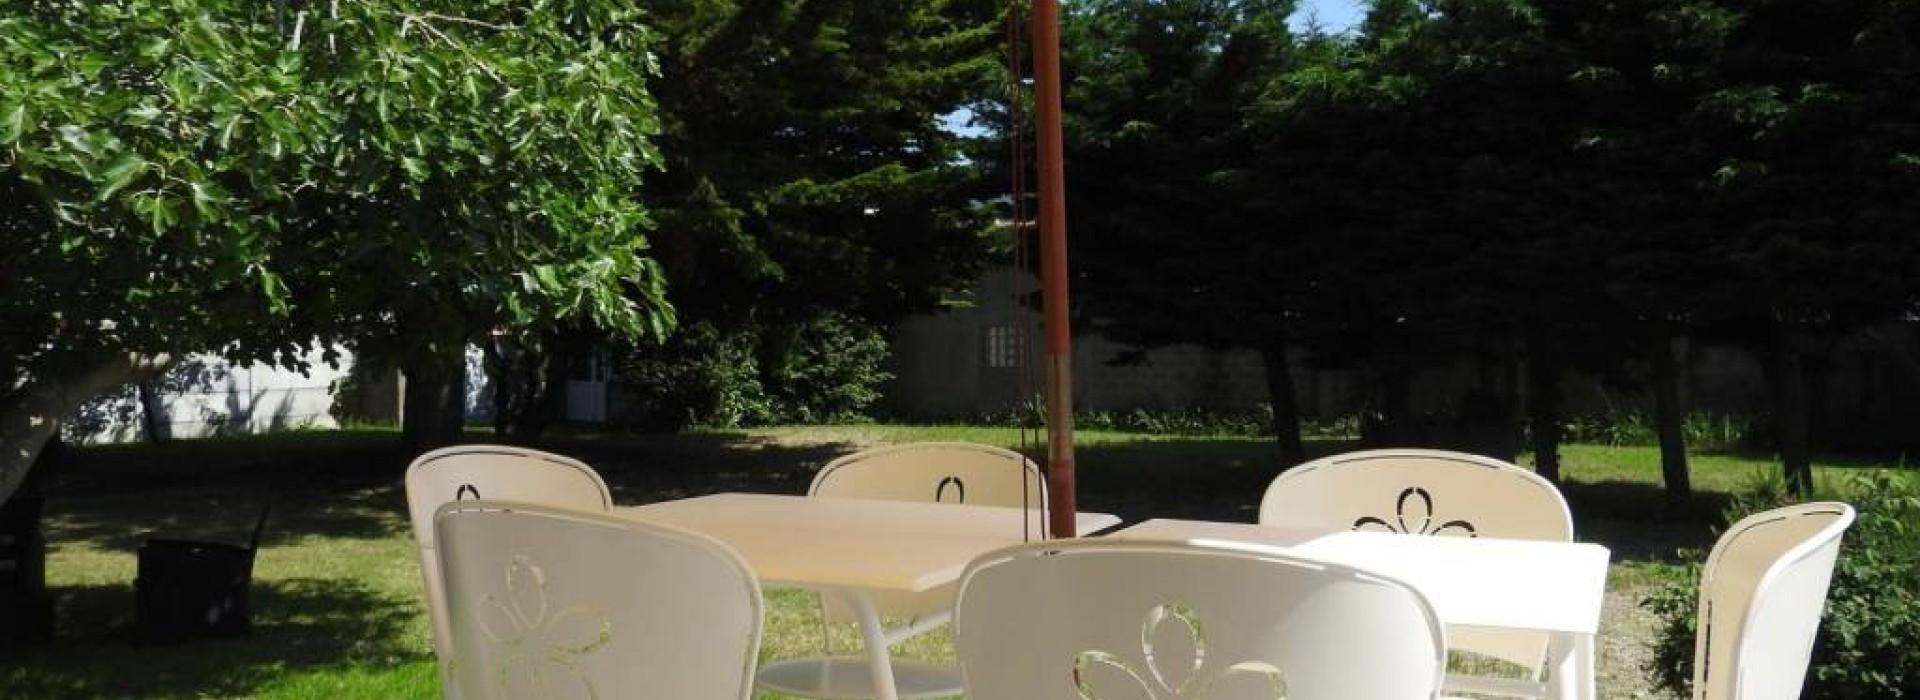 Allee Maison allee sardiniers maison t4 grand jardin: gites and holiday rentals